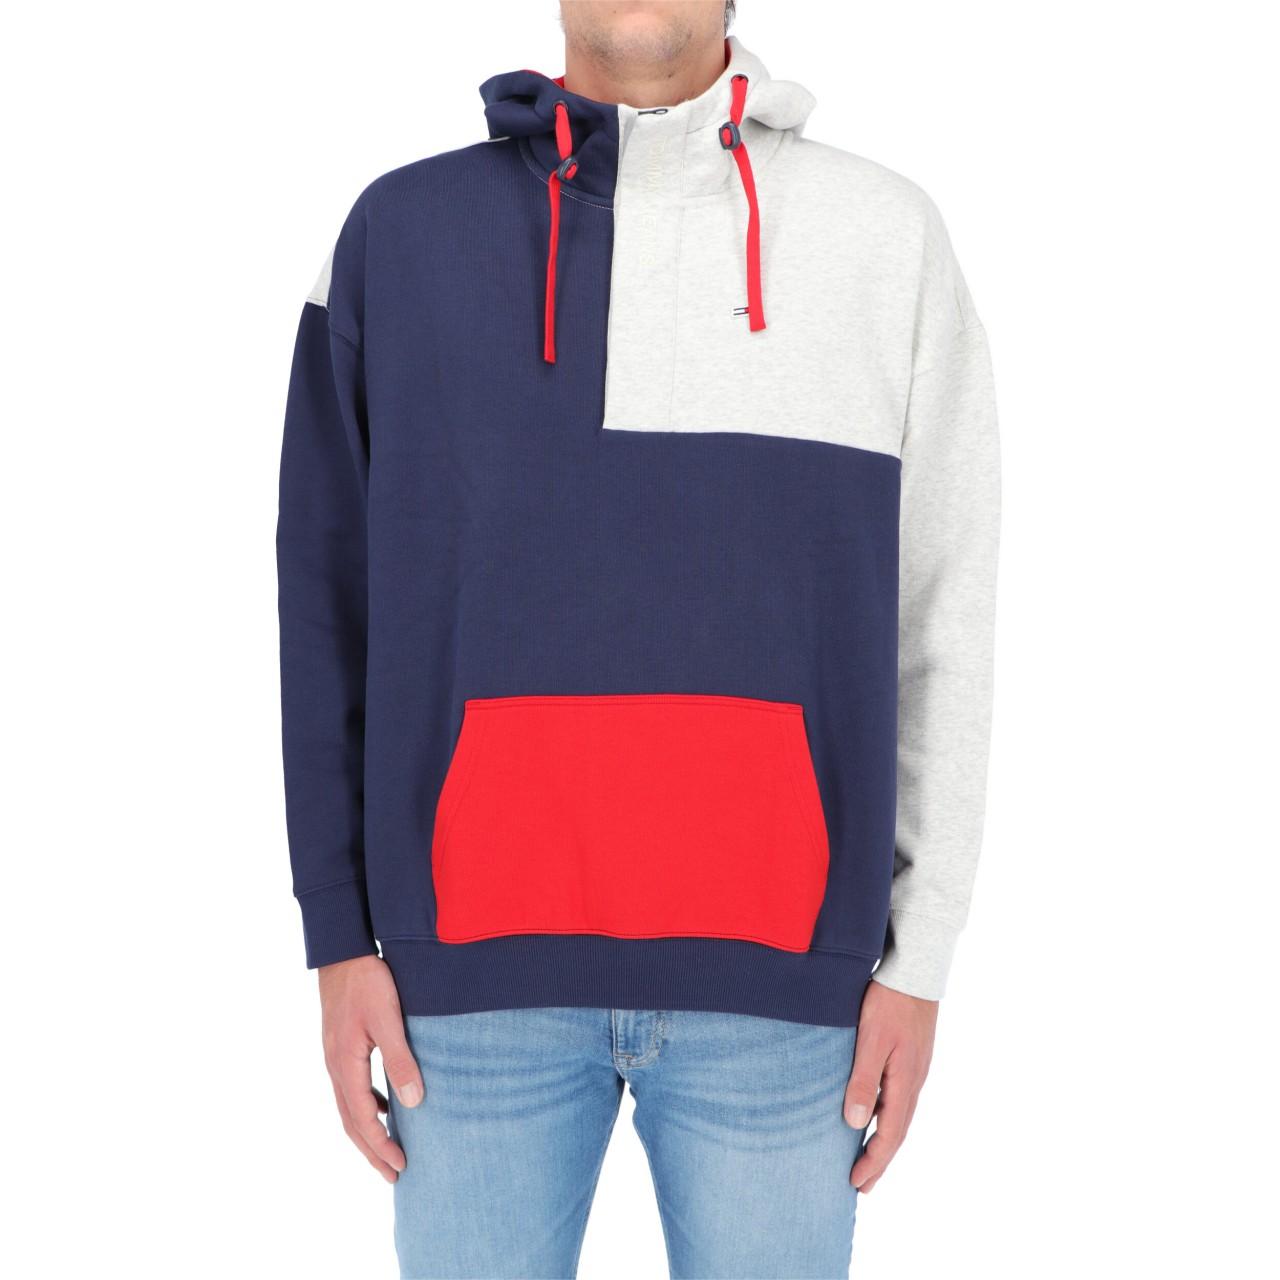 Tommy hilfiger Uomo Felpa Tommy Hilfiger Jeans Uomo Colorblock Hoodie Tjm 11639Q